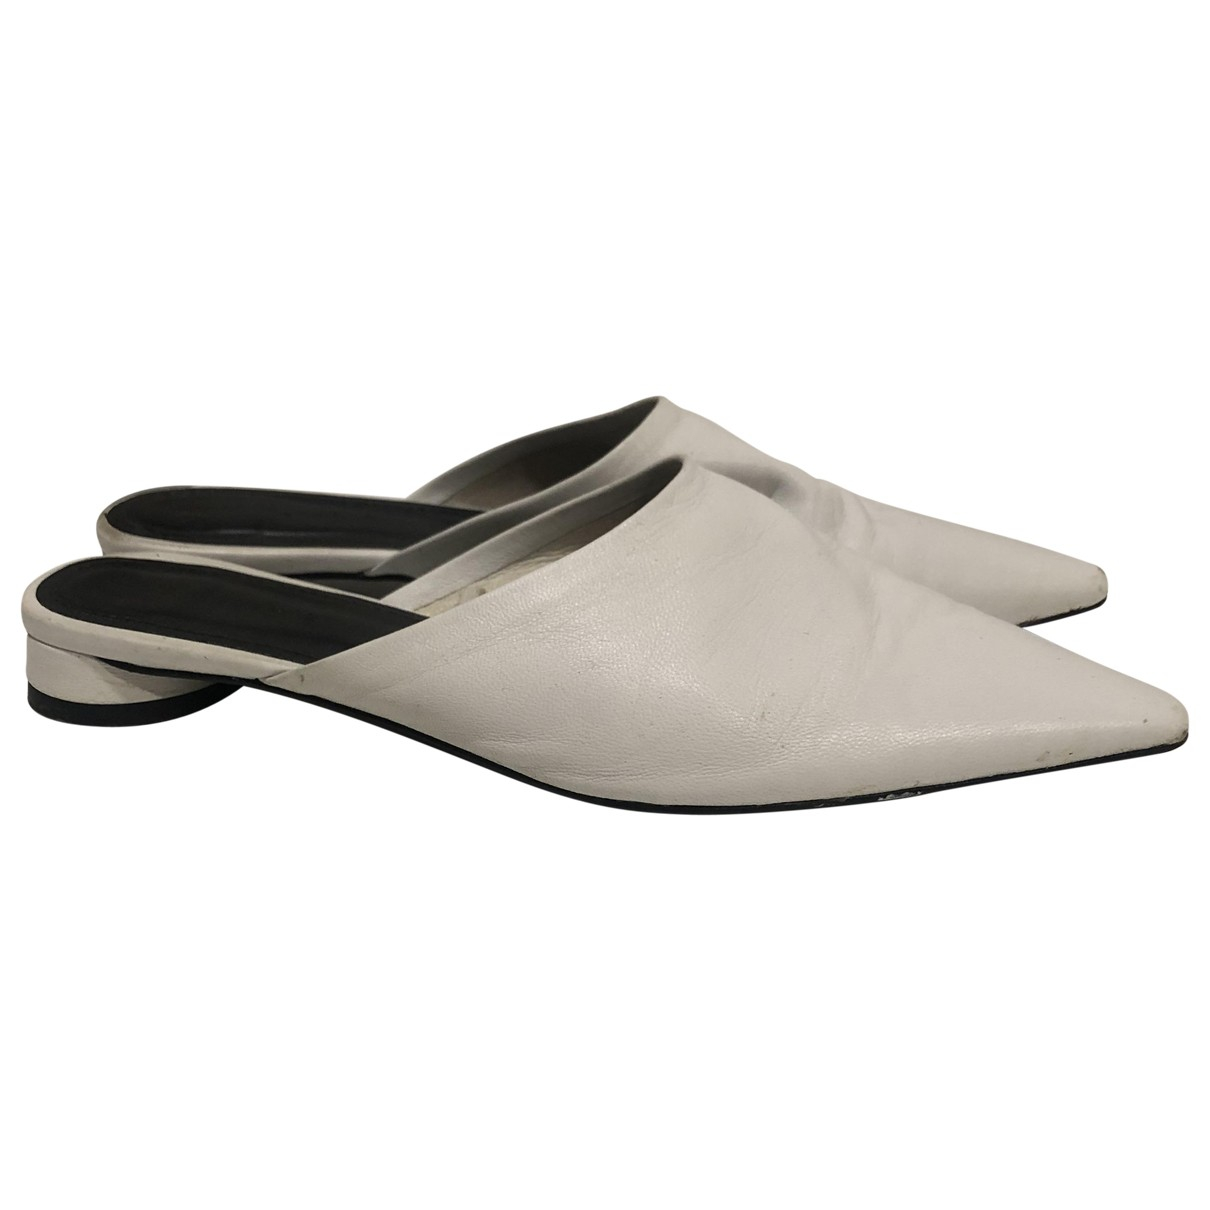 Zara \N White Patent leather Flats for Women 37 EU